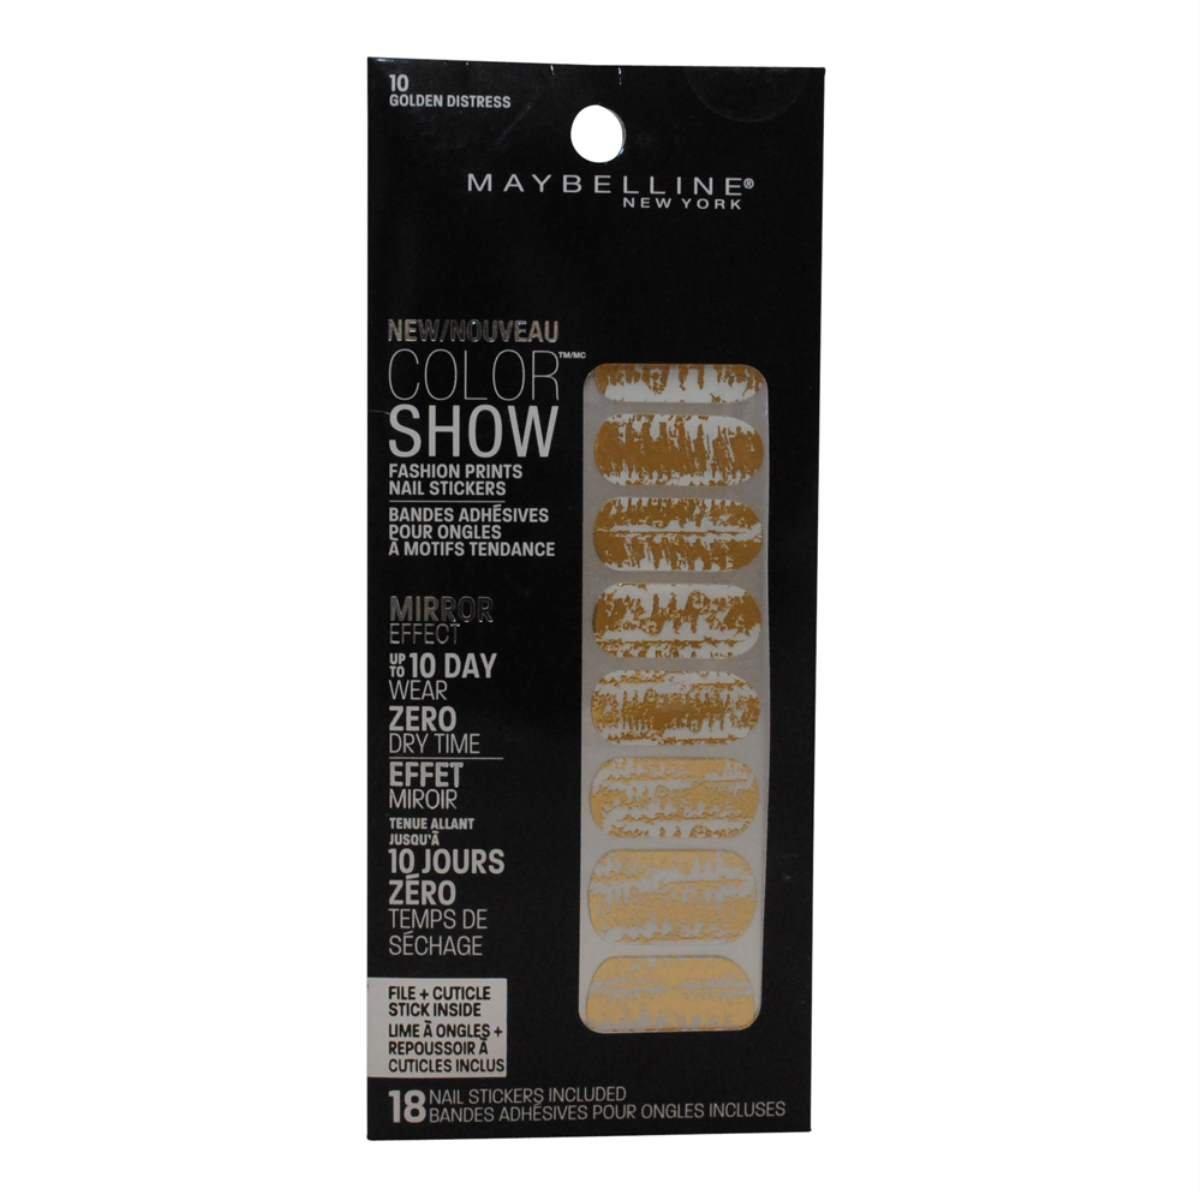 Amazon.com: Maybelline New York Color Show Fashion Prints Nail ...